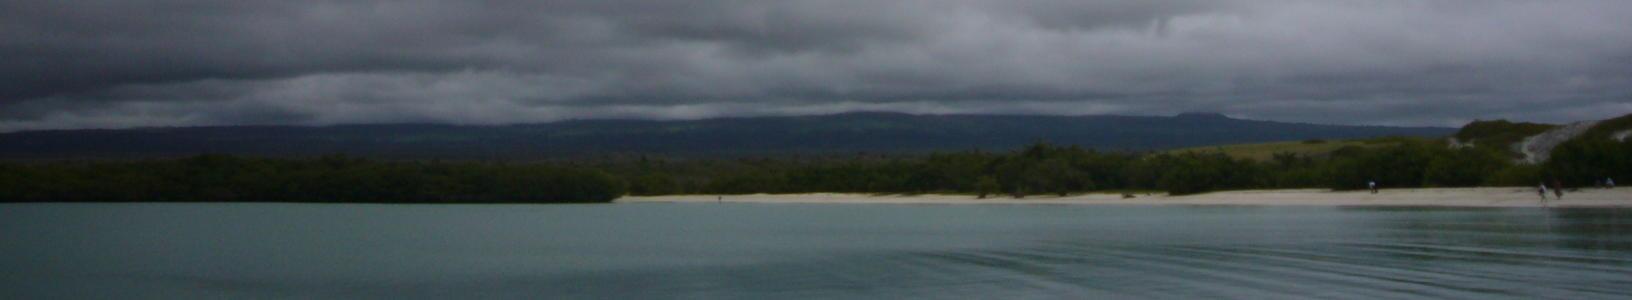 Bahía Tortuga, Santa Cruz.